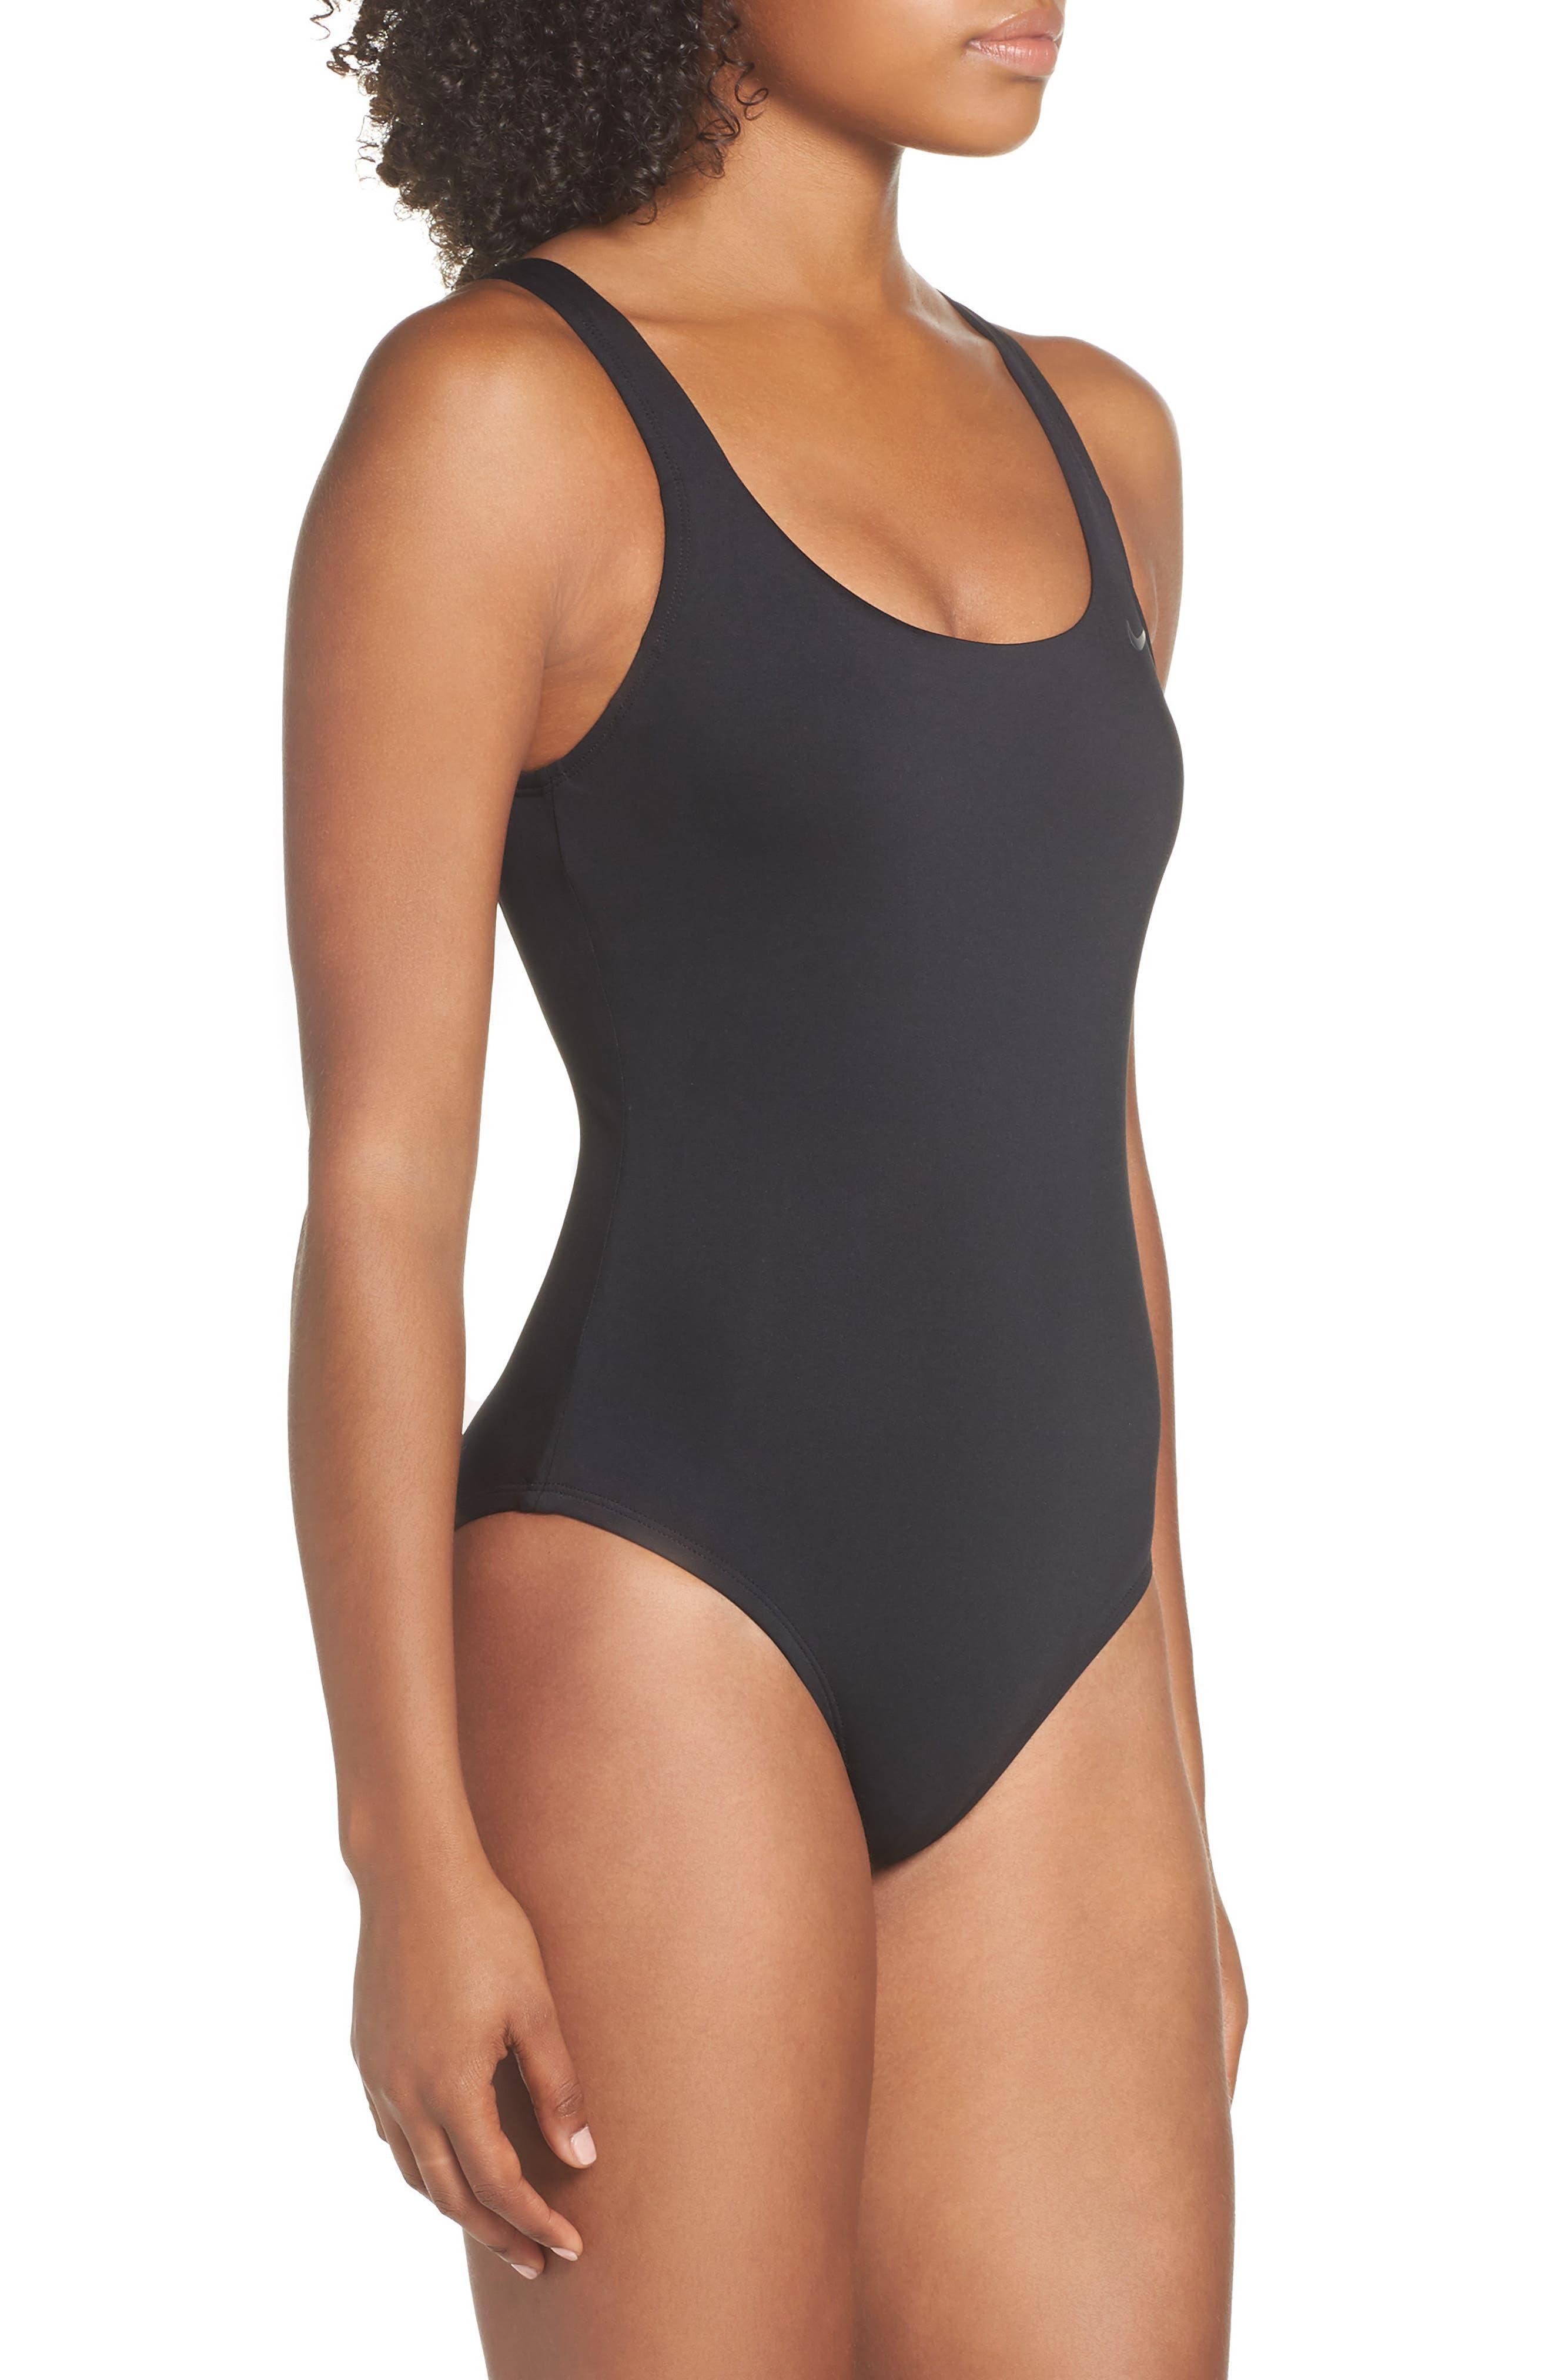 NIKE,                             U-Back One-Piece Swimsuit,                             Alternate thumbnail 3, color,                             BLACK